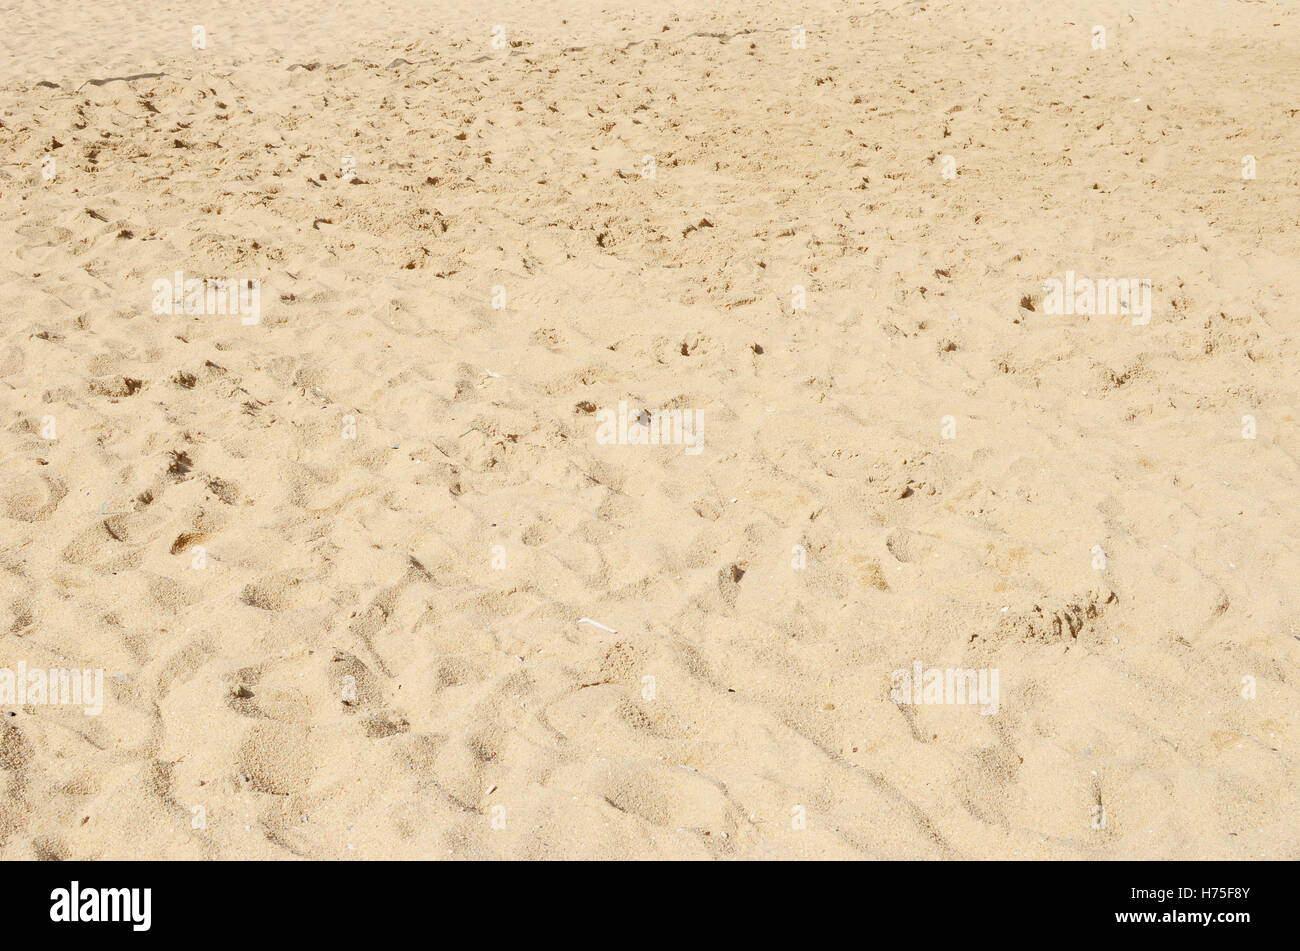 beach sand background - Stock Image